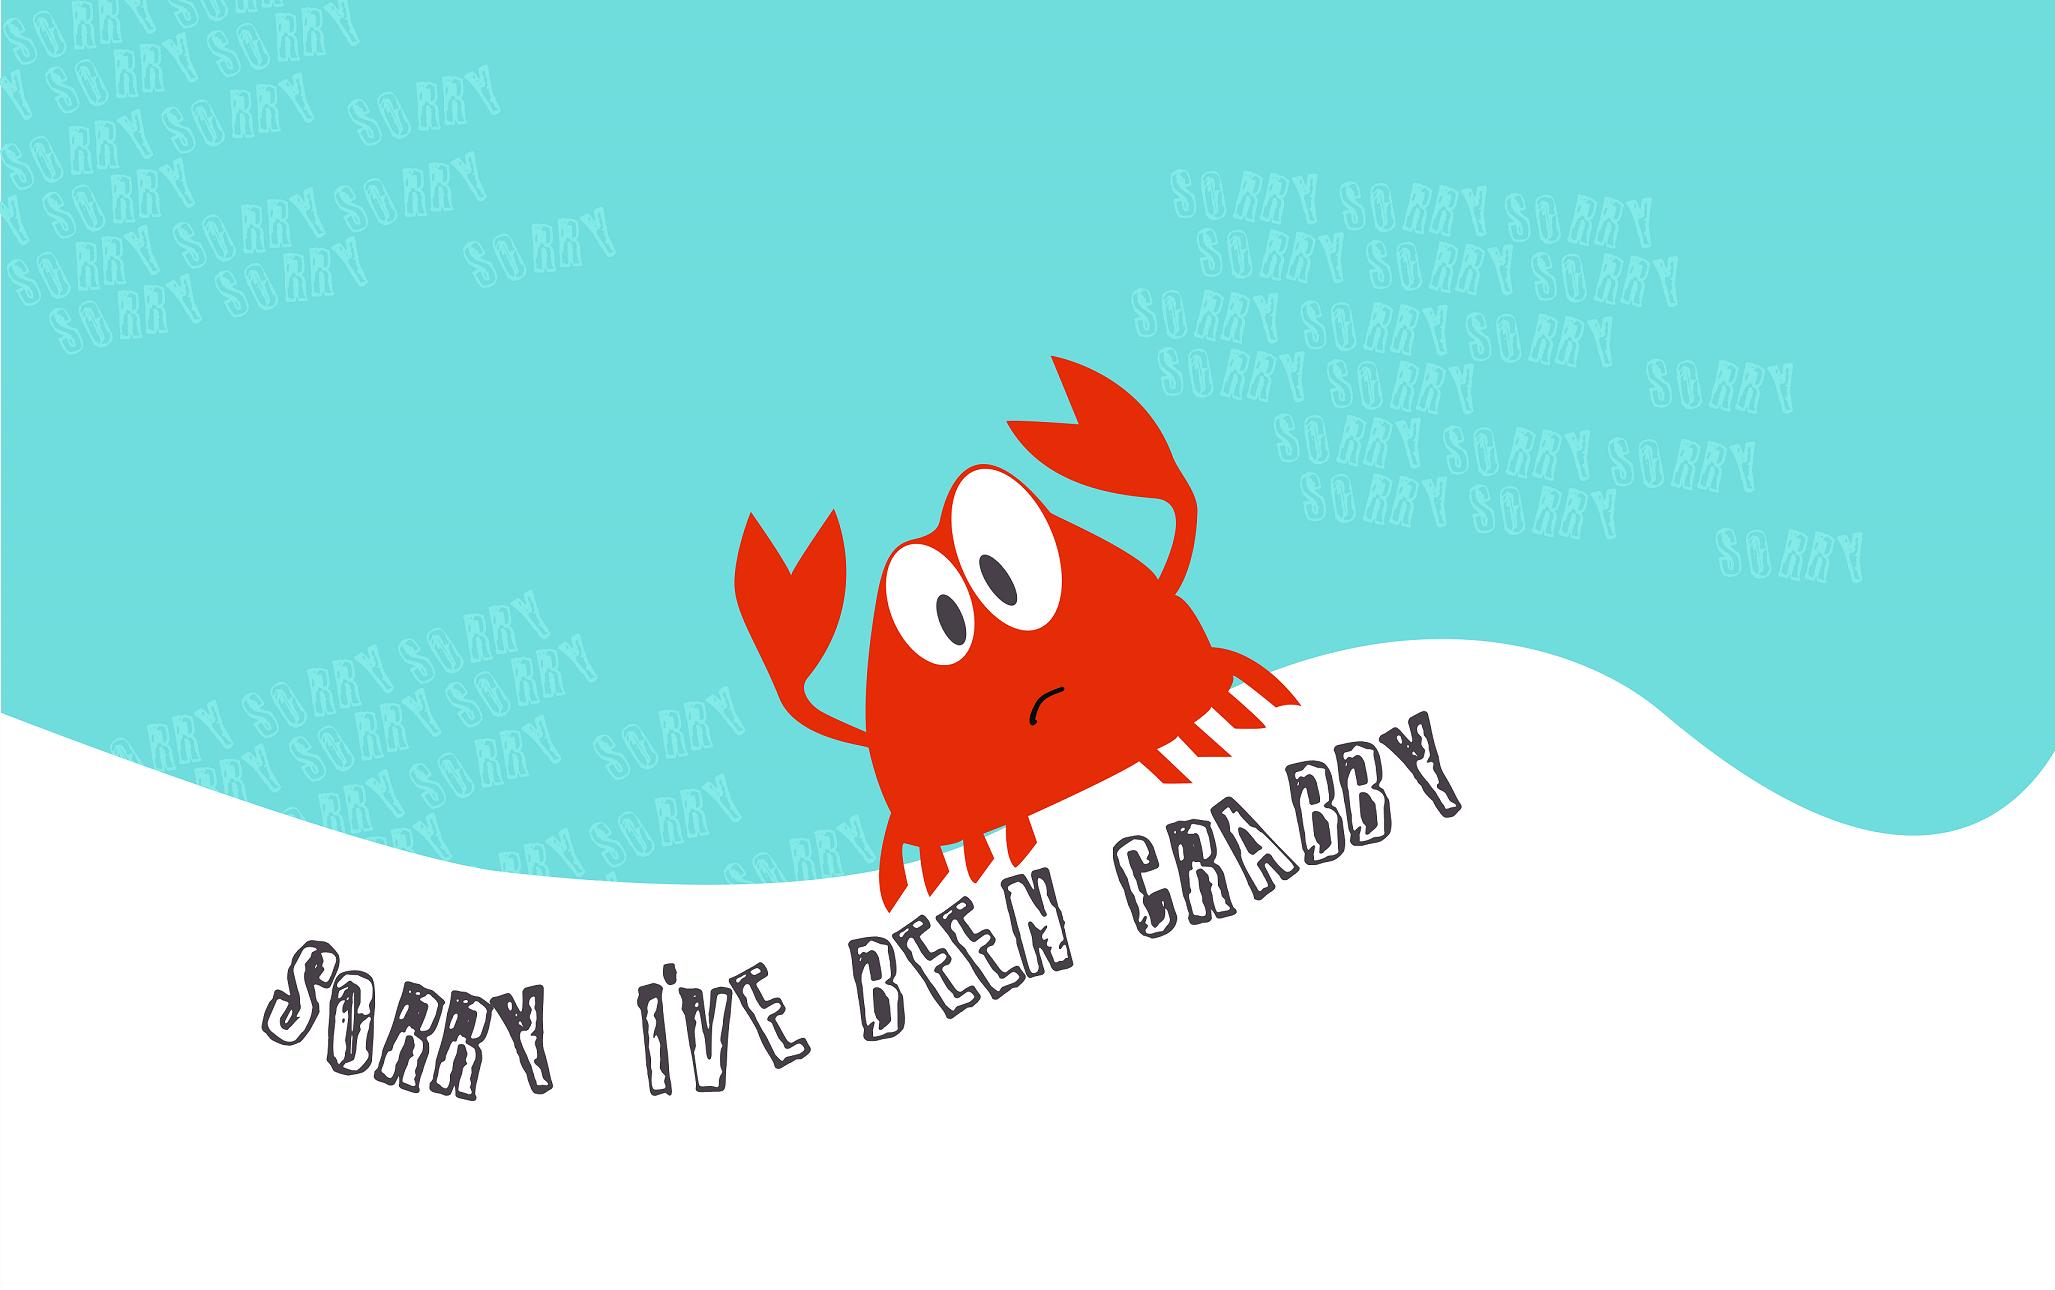 Crabby ecards